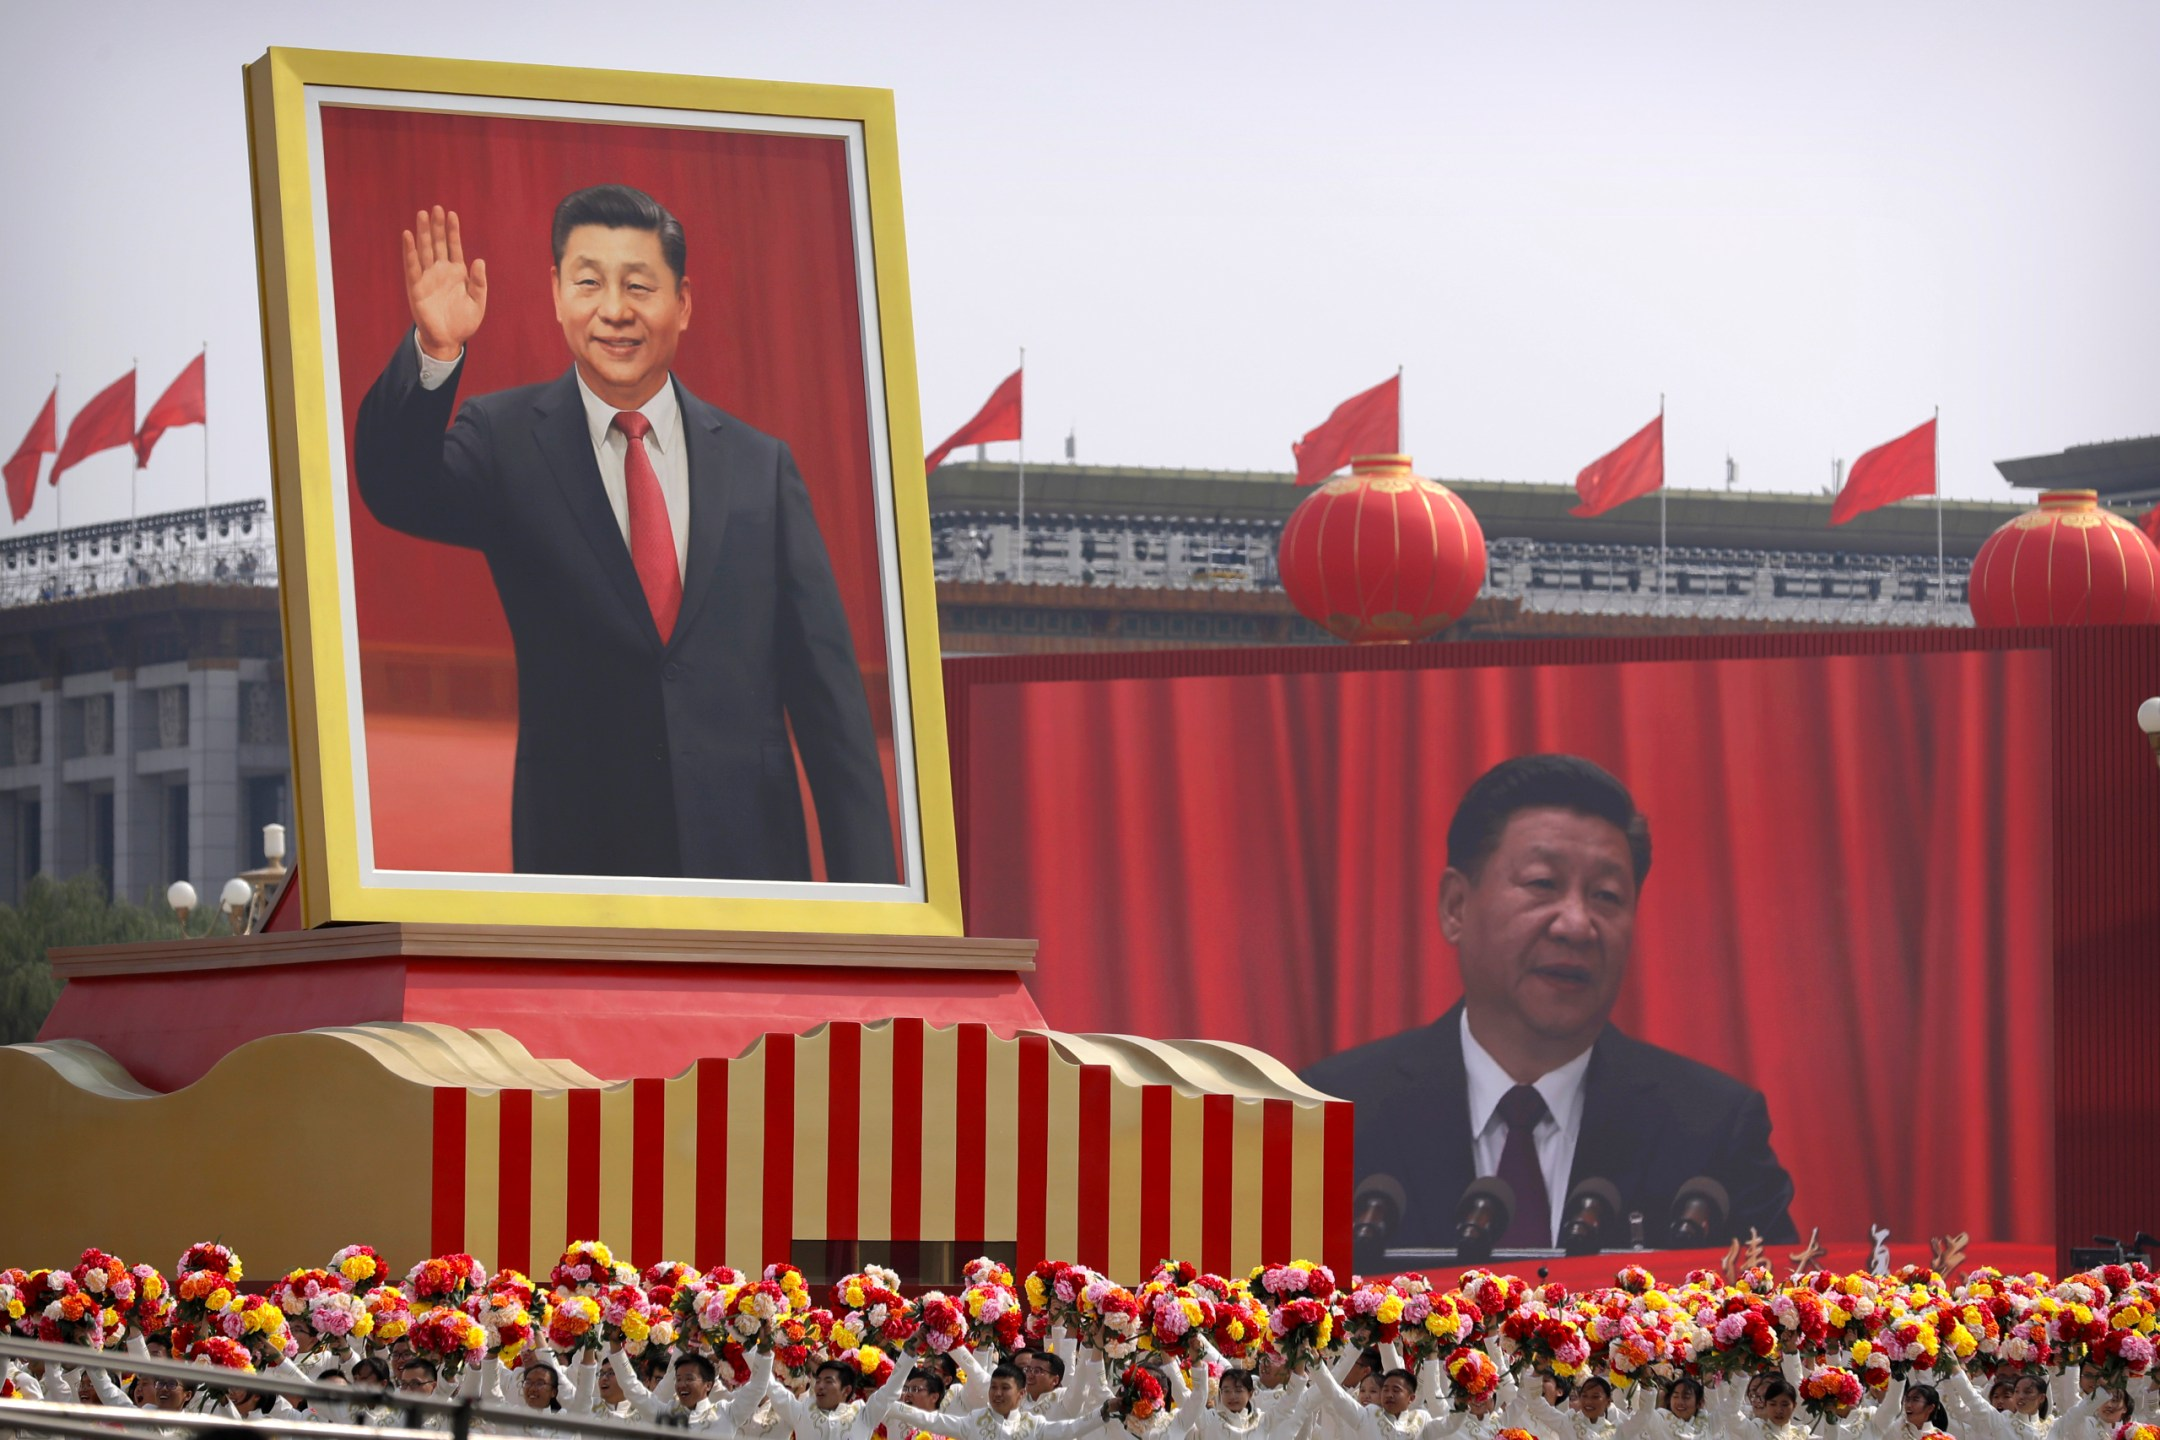 Biden's anti-China campaign collapses - Reuters reveals how Beijing split Western alliance